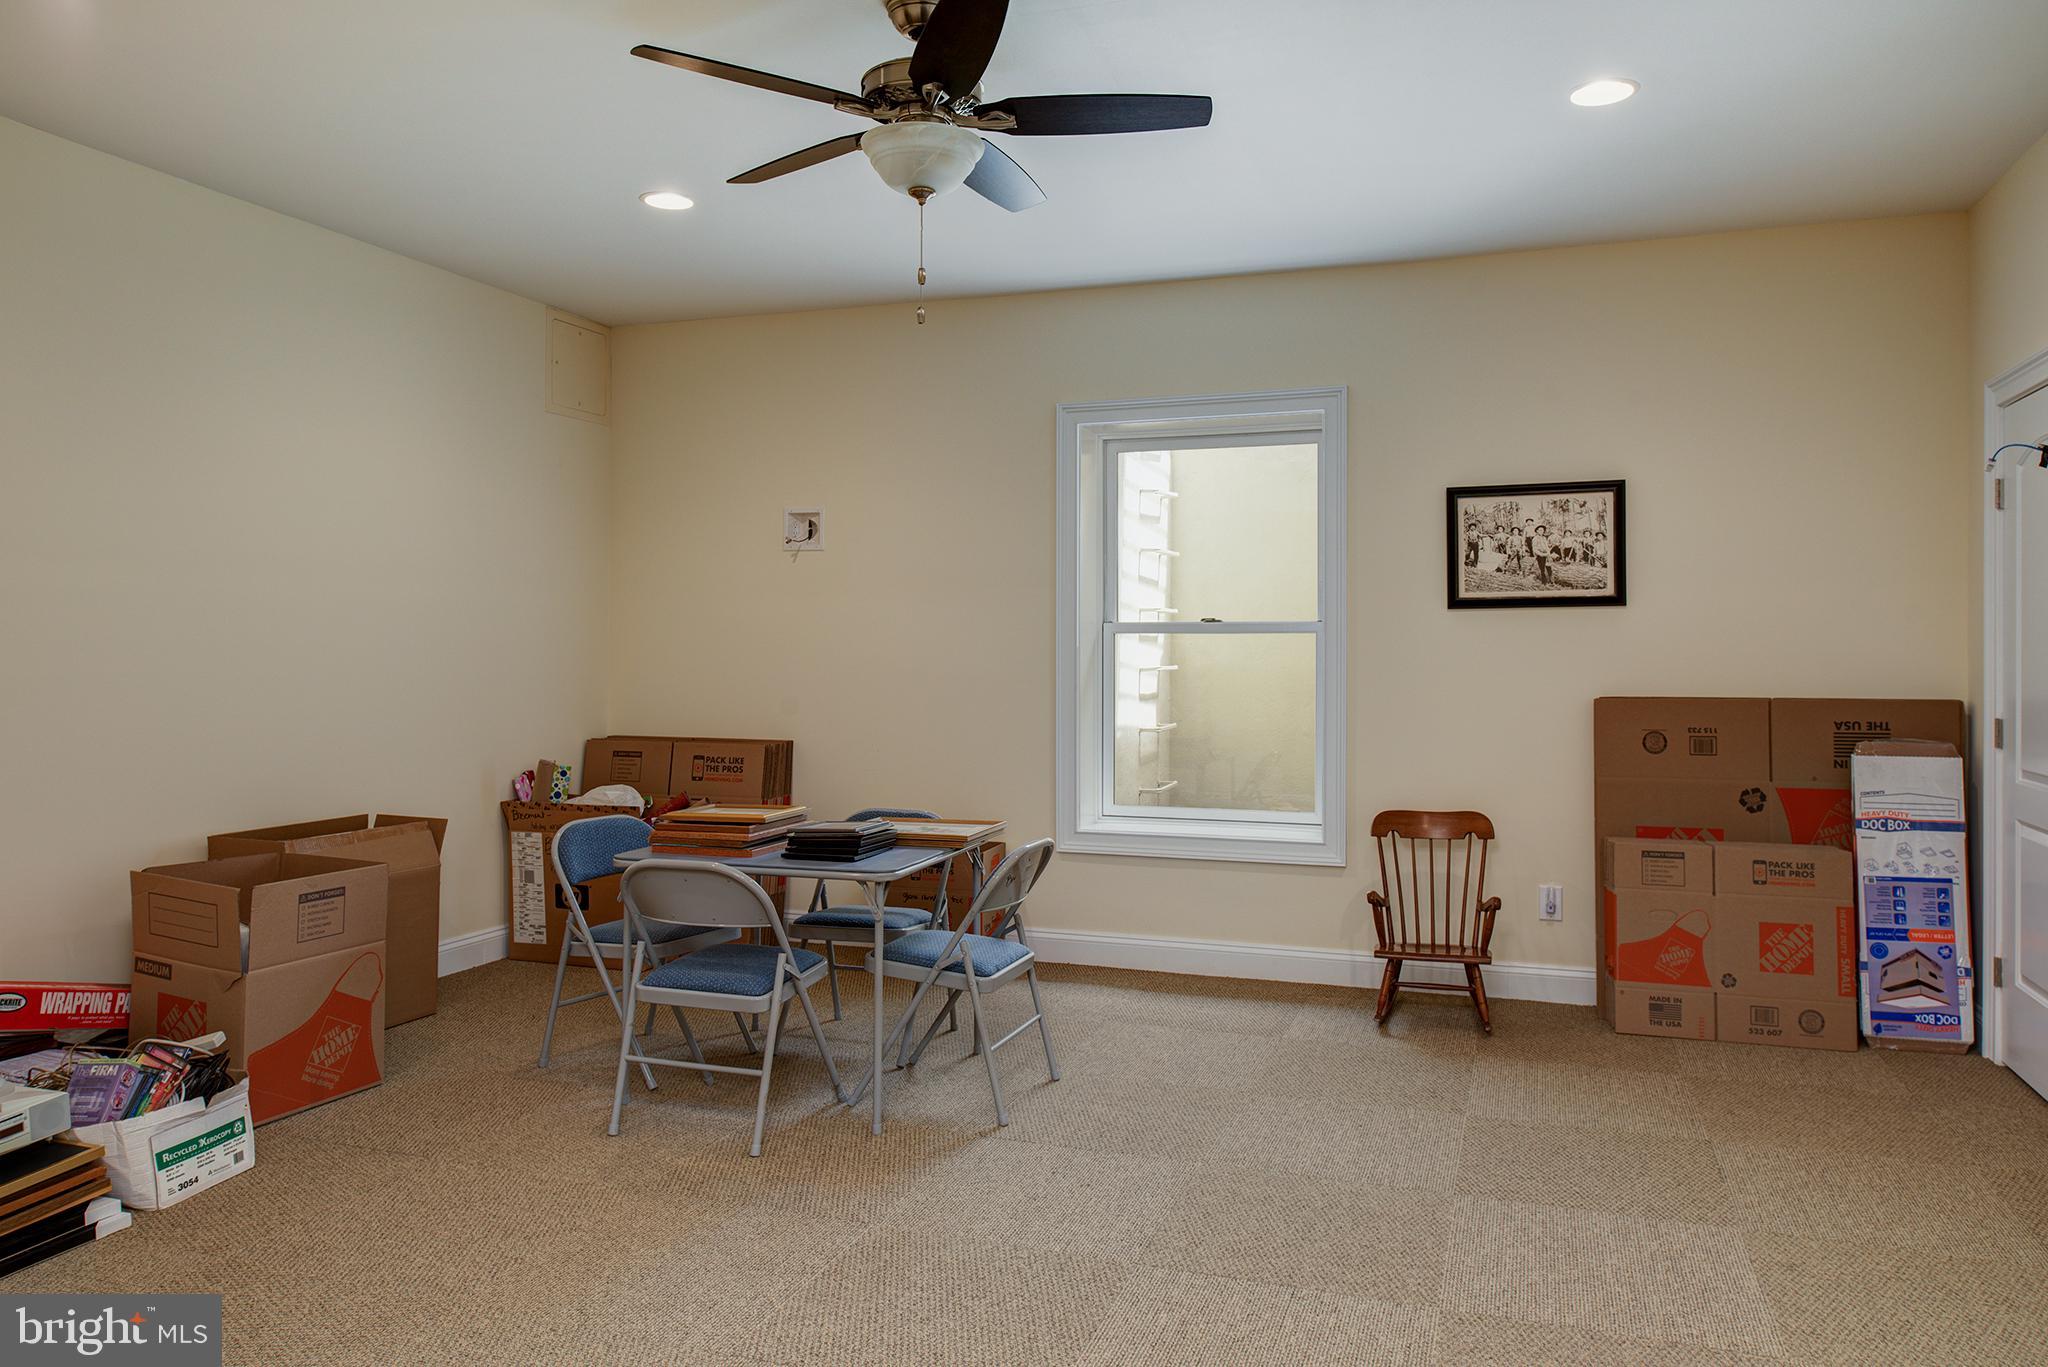 4621 Holly Avenue, Fairfax, VA 22030 | Jim & Dawn Gaskill